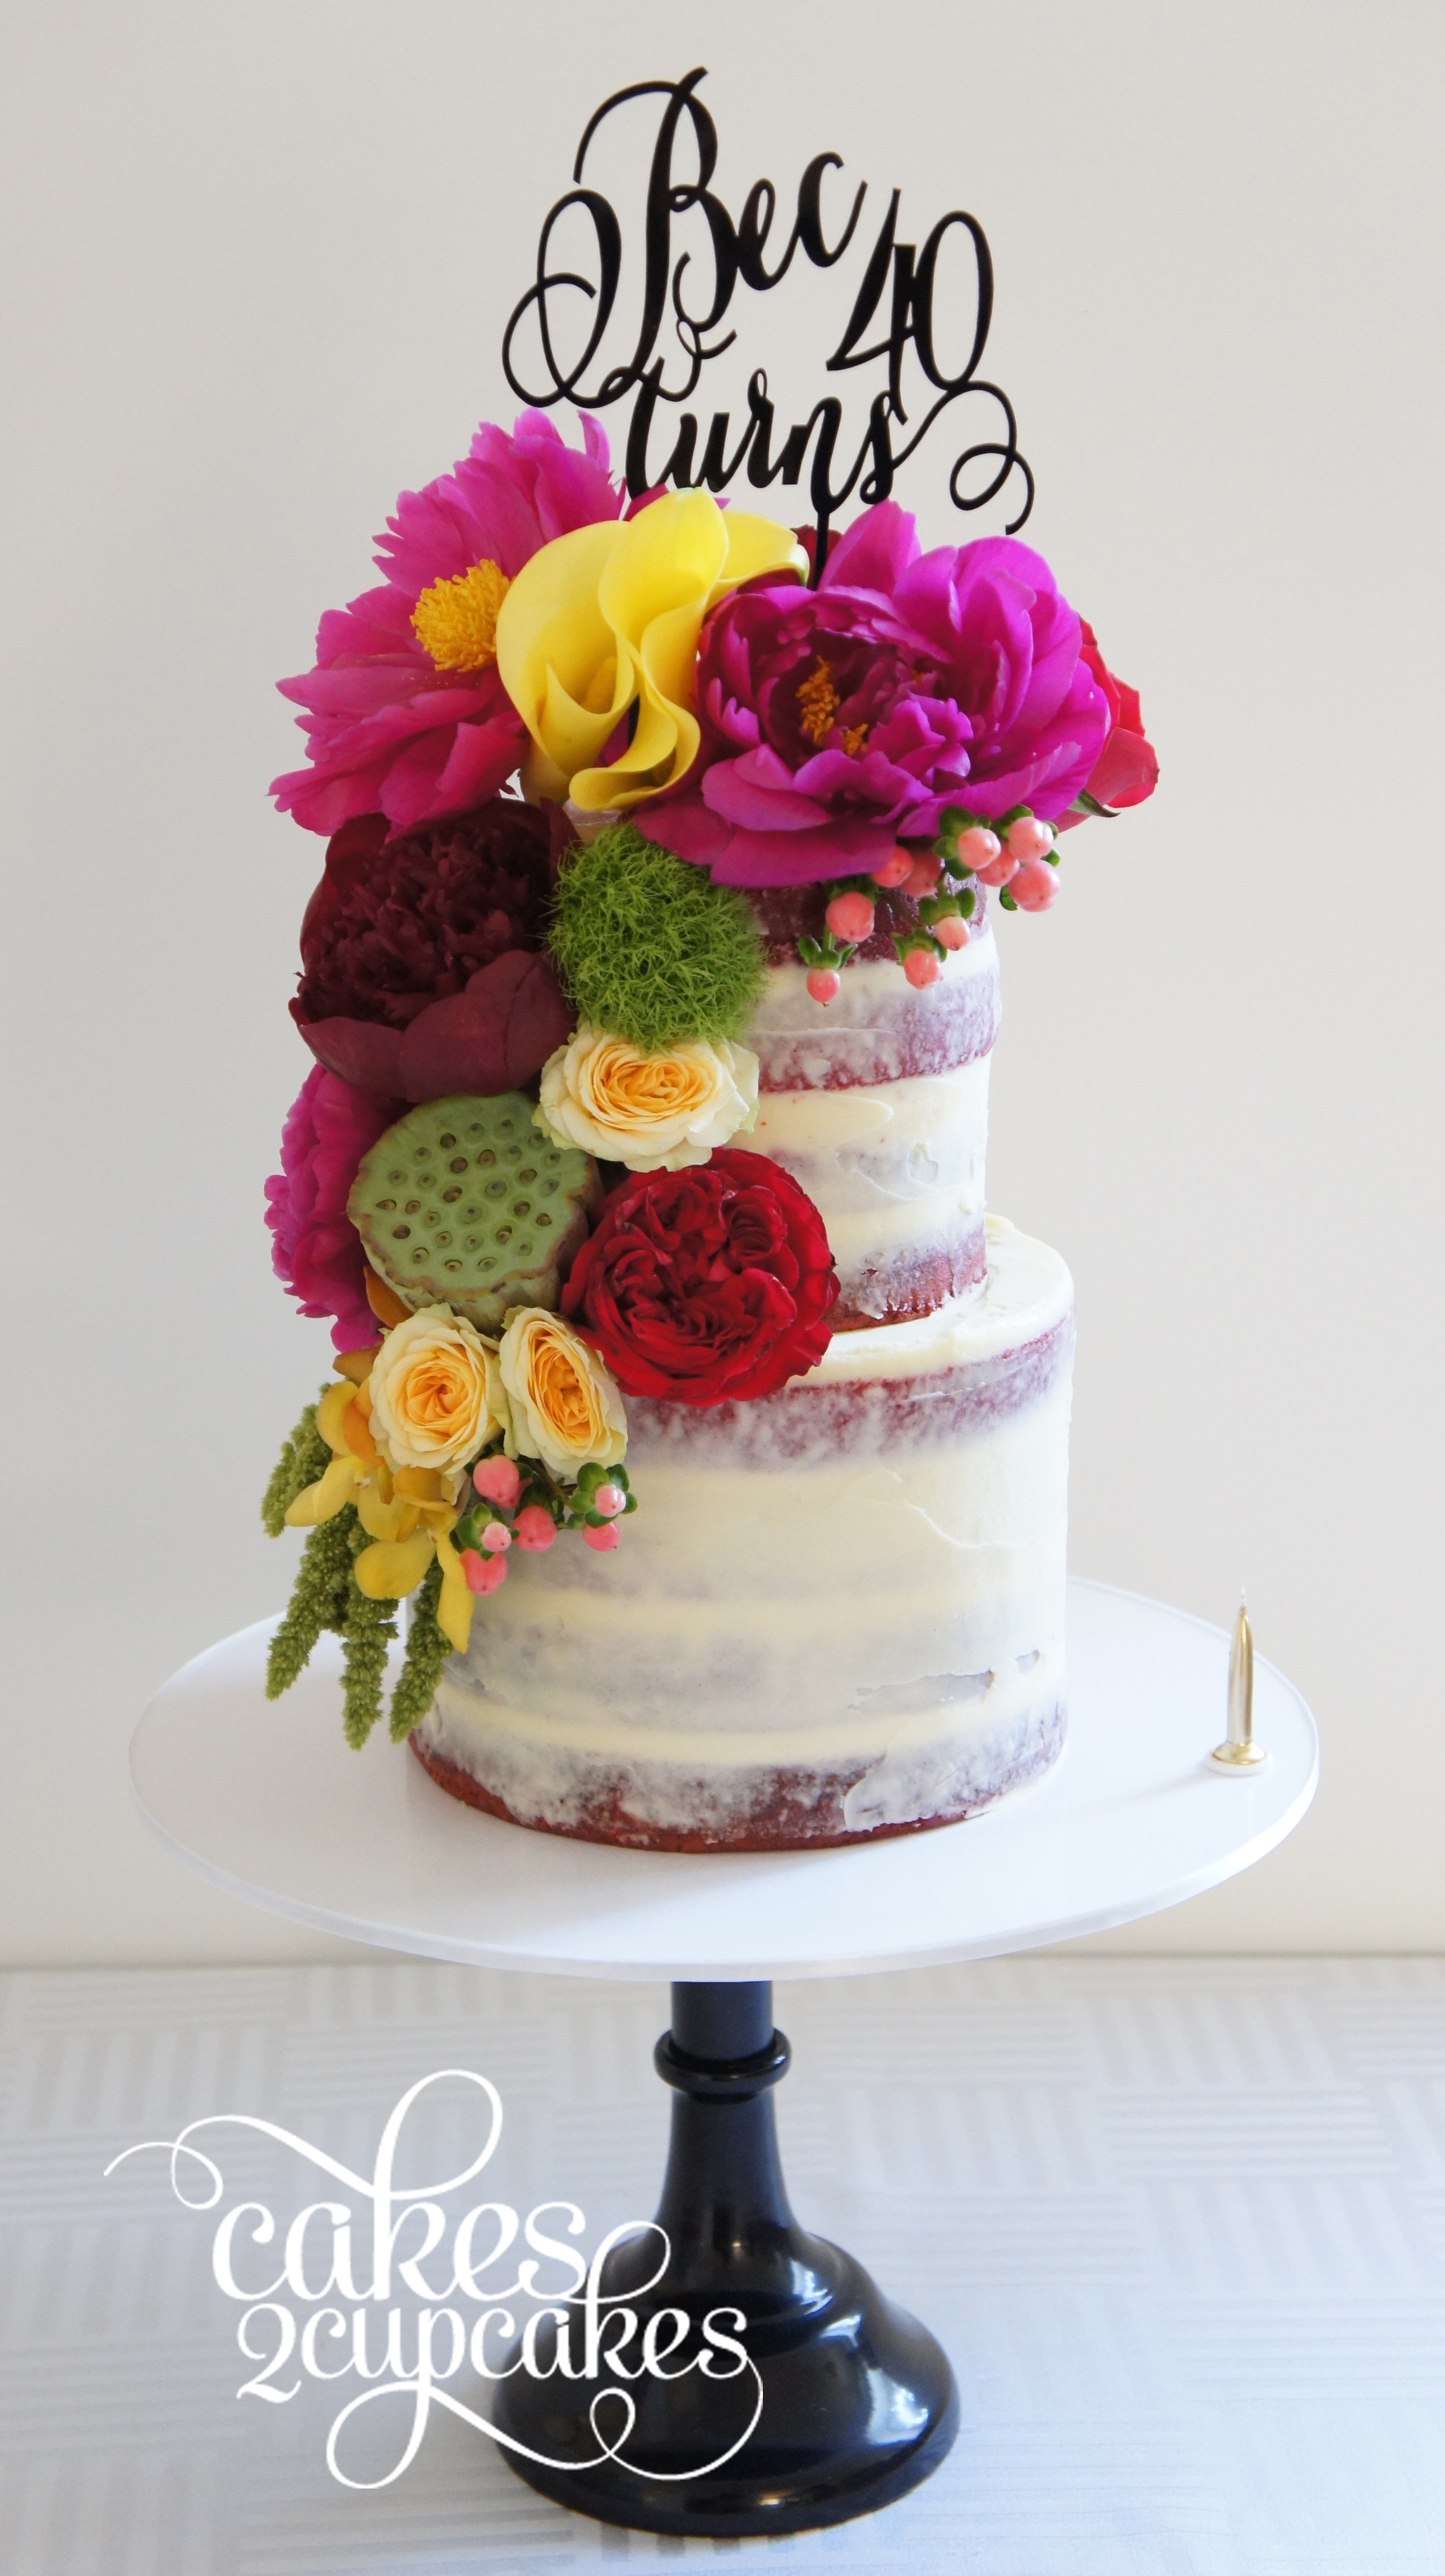 cakes2cupcakes-bec40